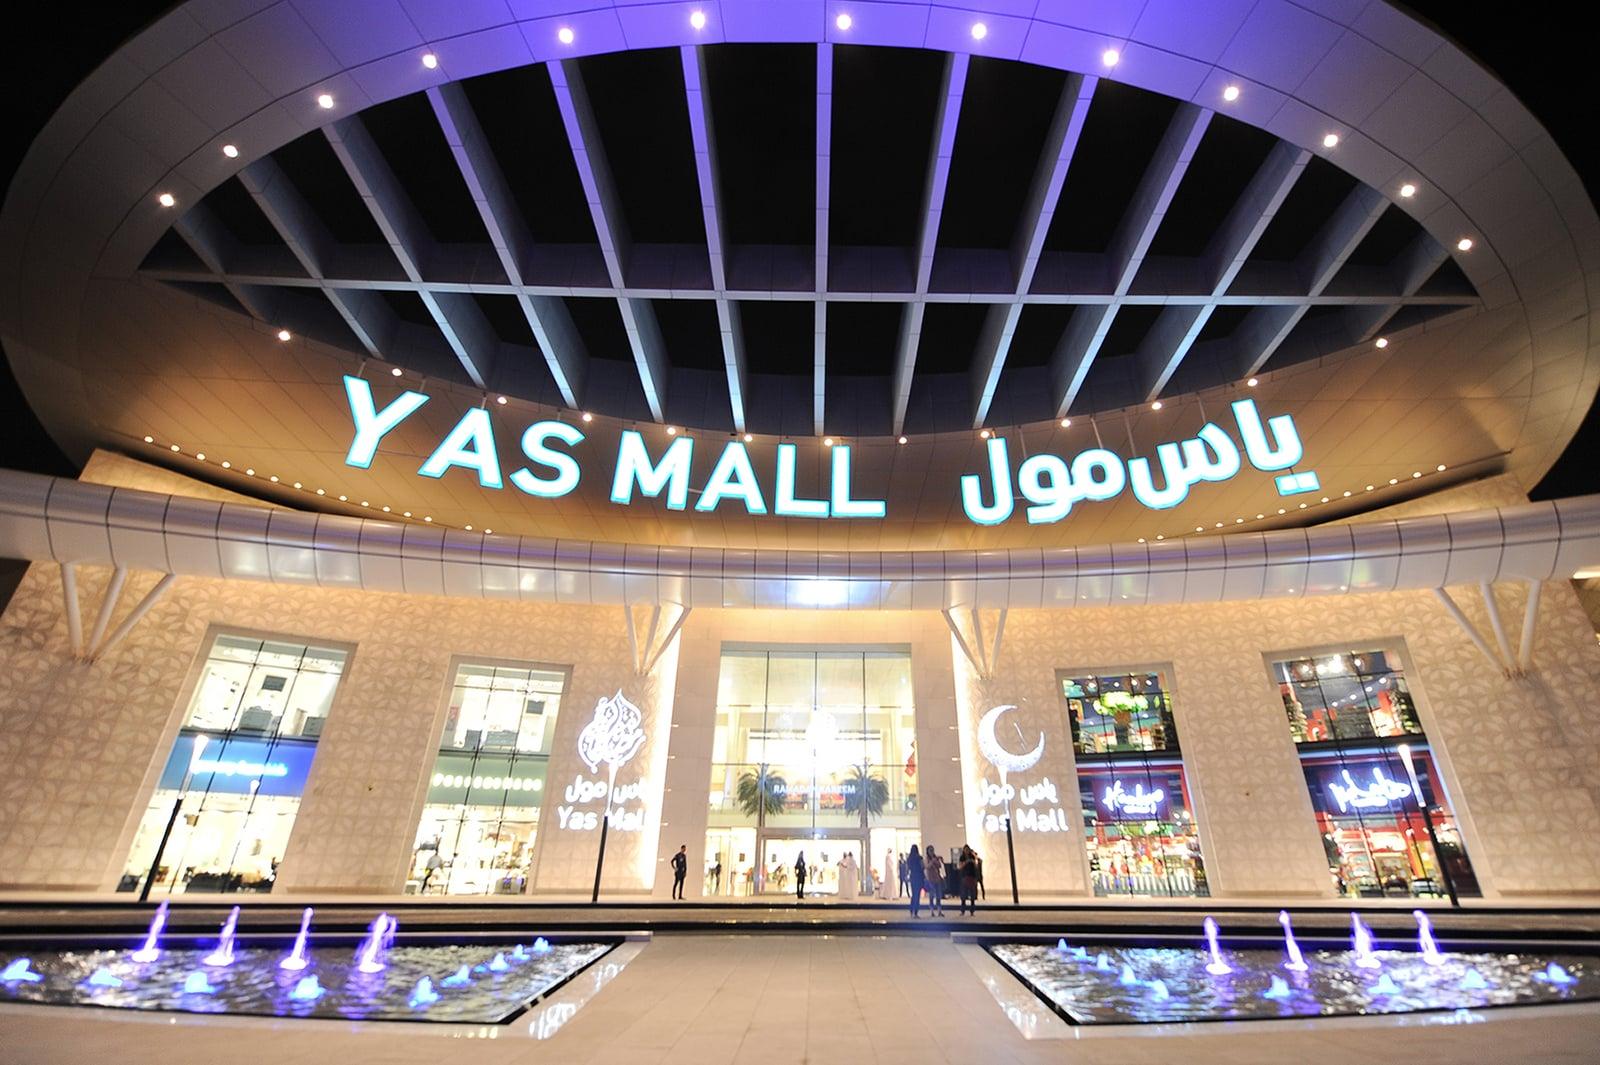 Yas mall abu dhabi open 24 hours for a mega eid sale popsugar share this link solutioingenieria Choice Image